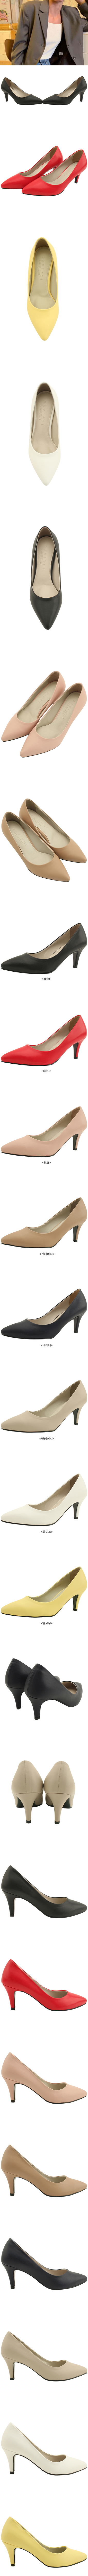 Stiletto high heel basic shoes 7cm white